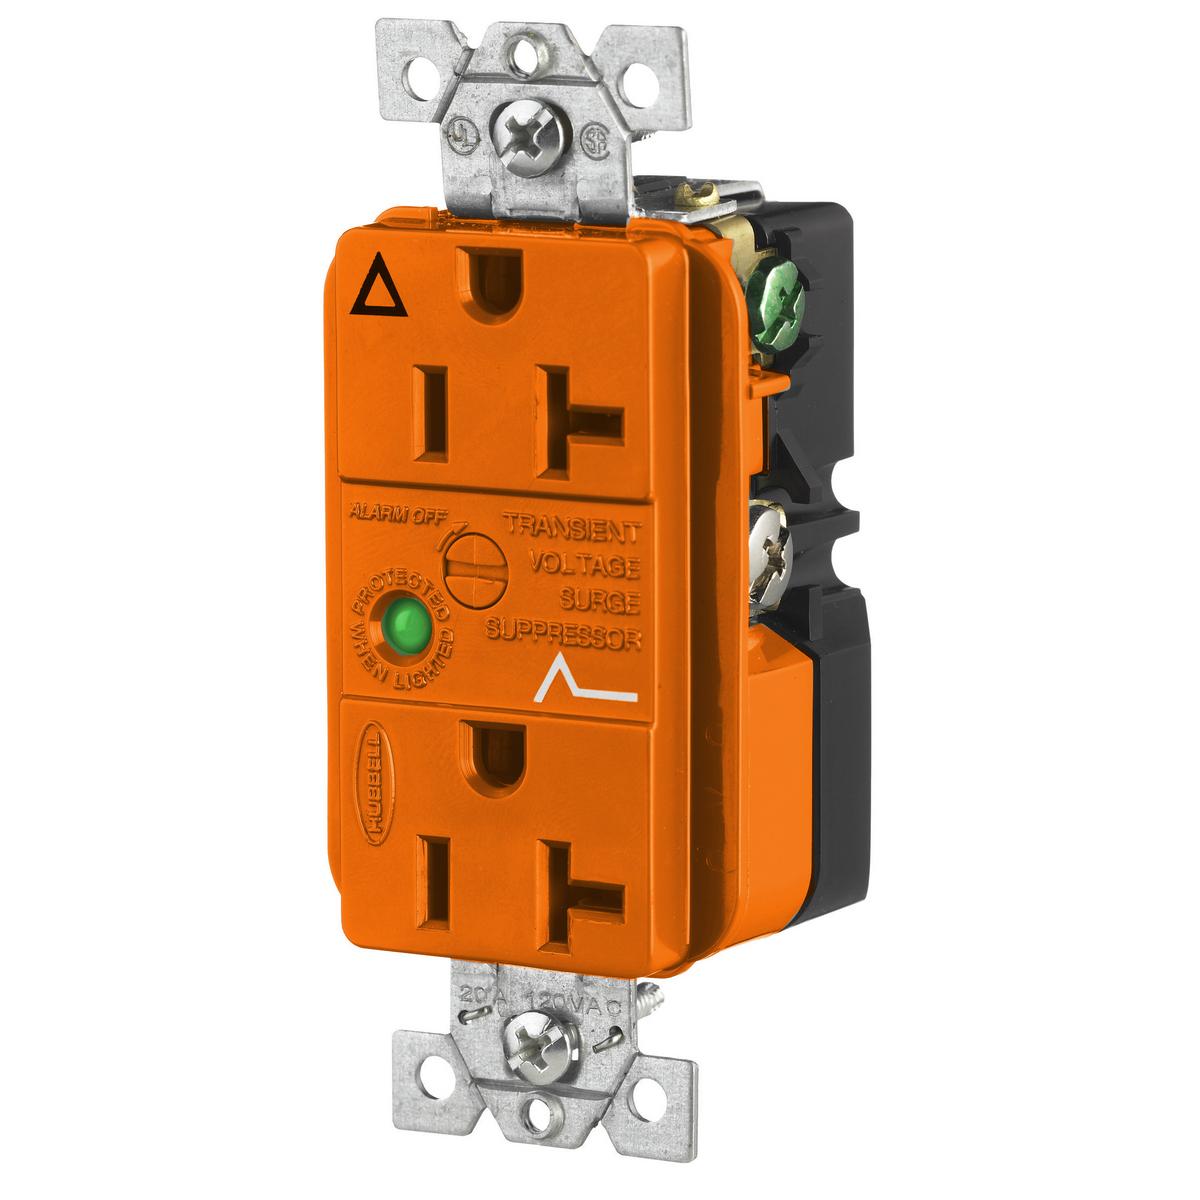 Hubbell IG5362OSA 20 Amp 125 Volt 2-Pole 3-Wire NEMA 5-20R Orange Straight Blade Duplex Receptacle